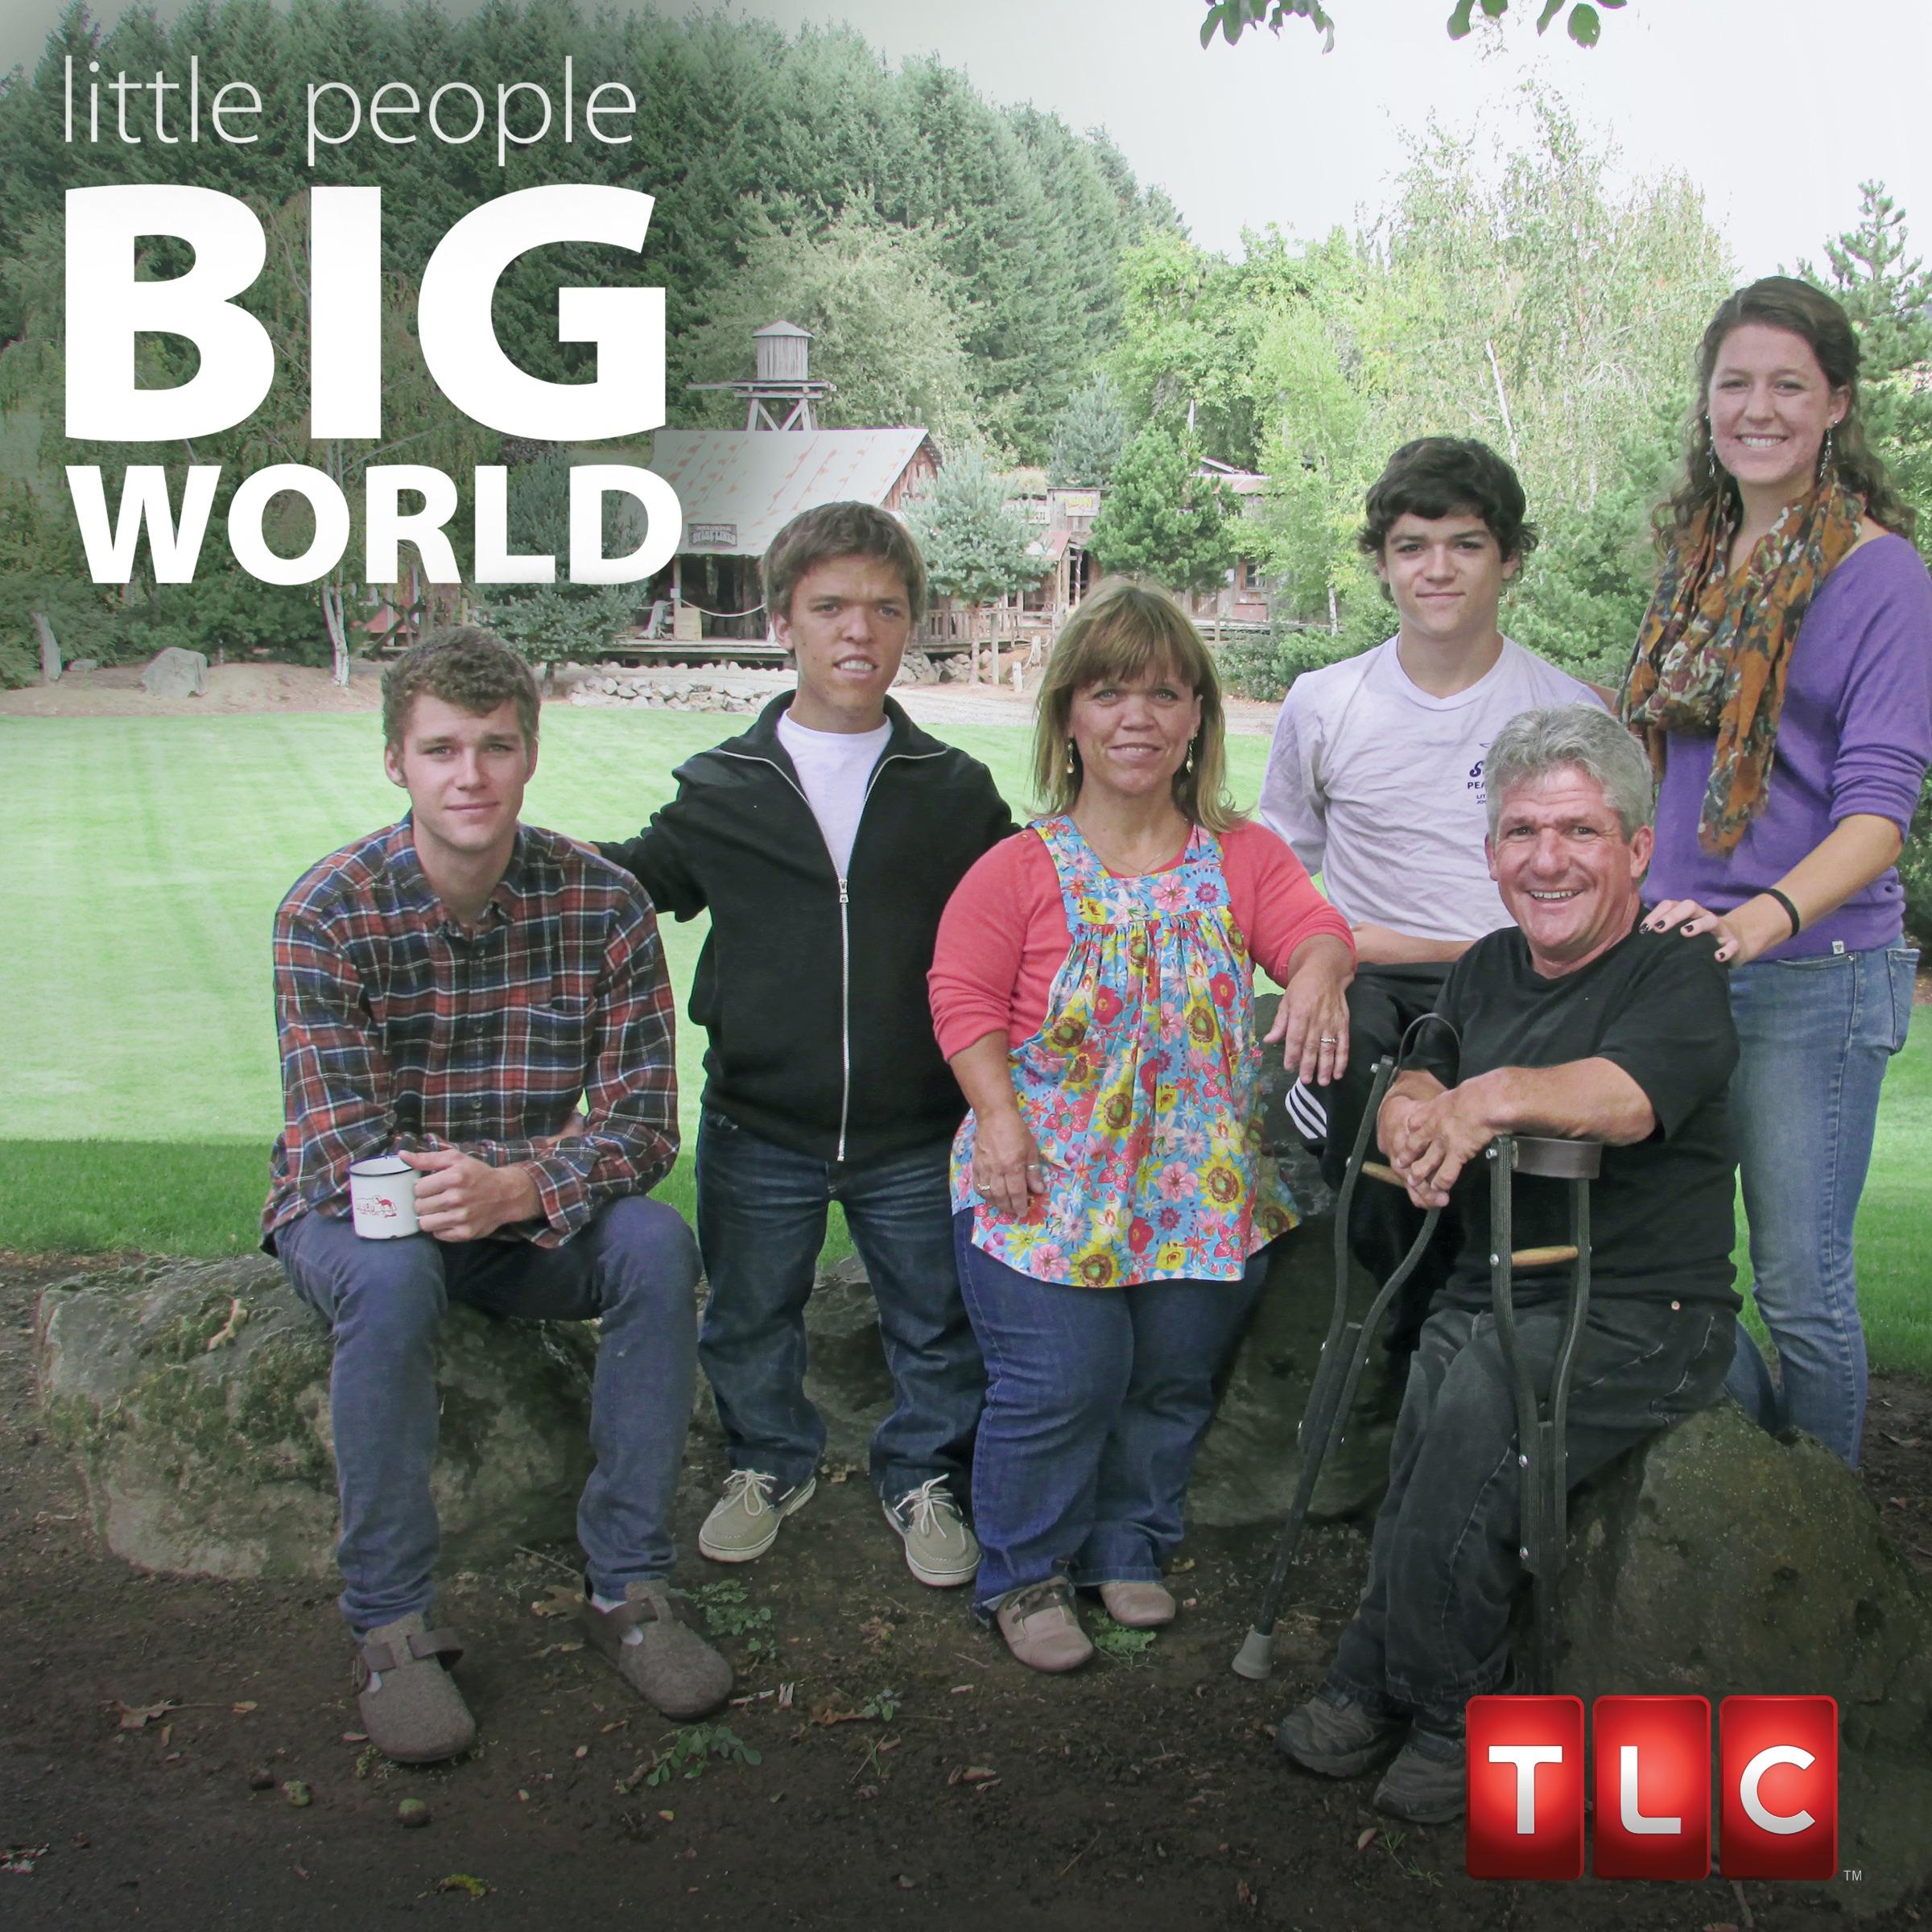 Little People Big World Season 12 On Itunes